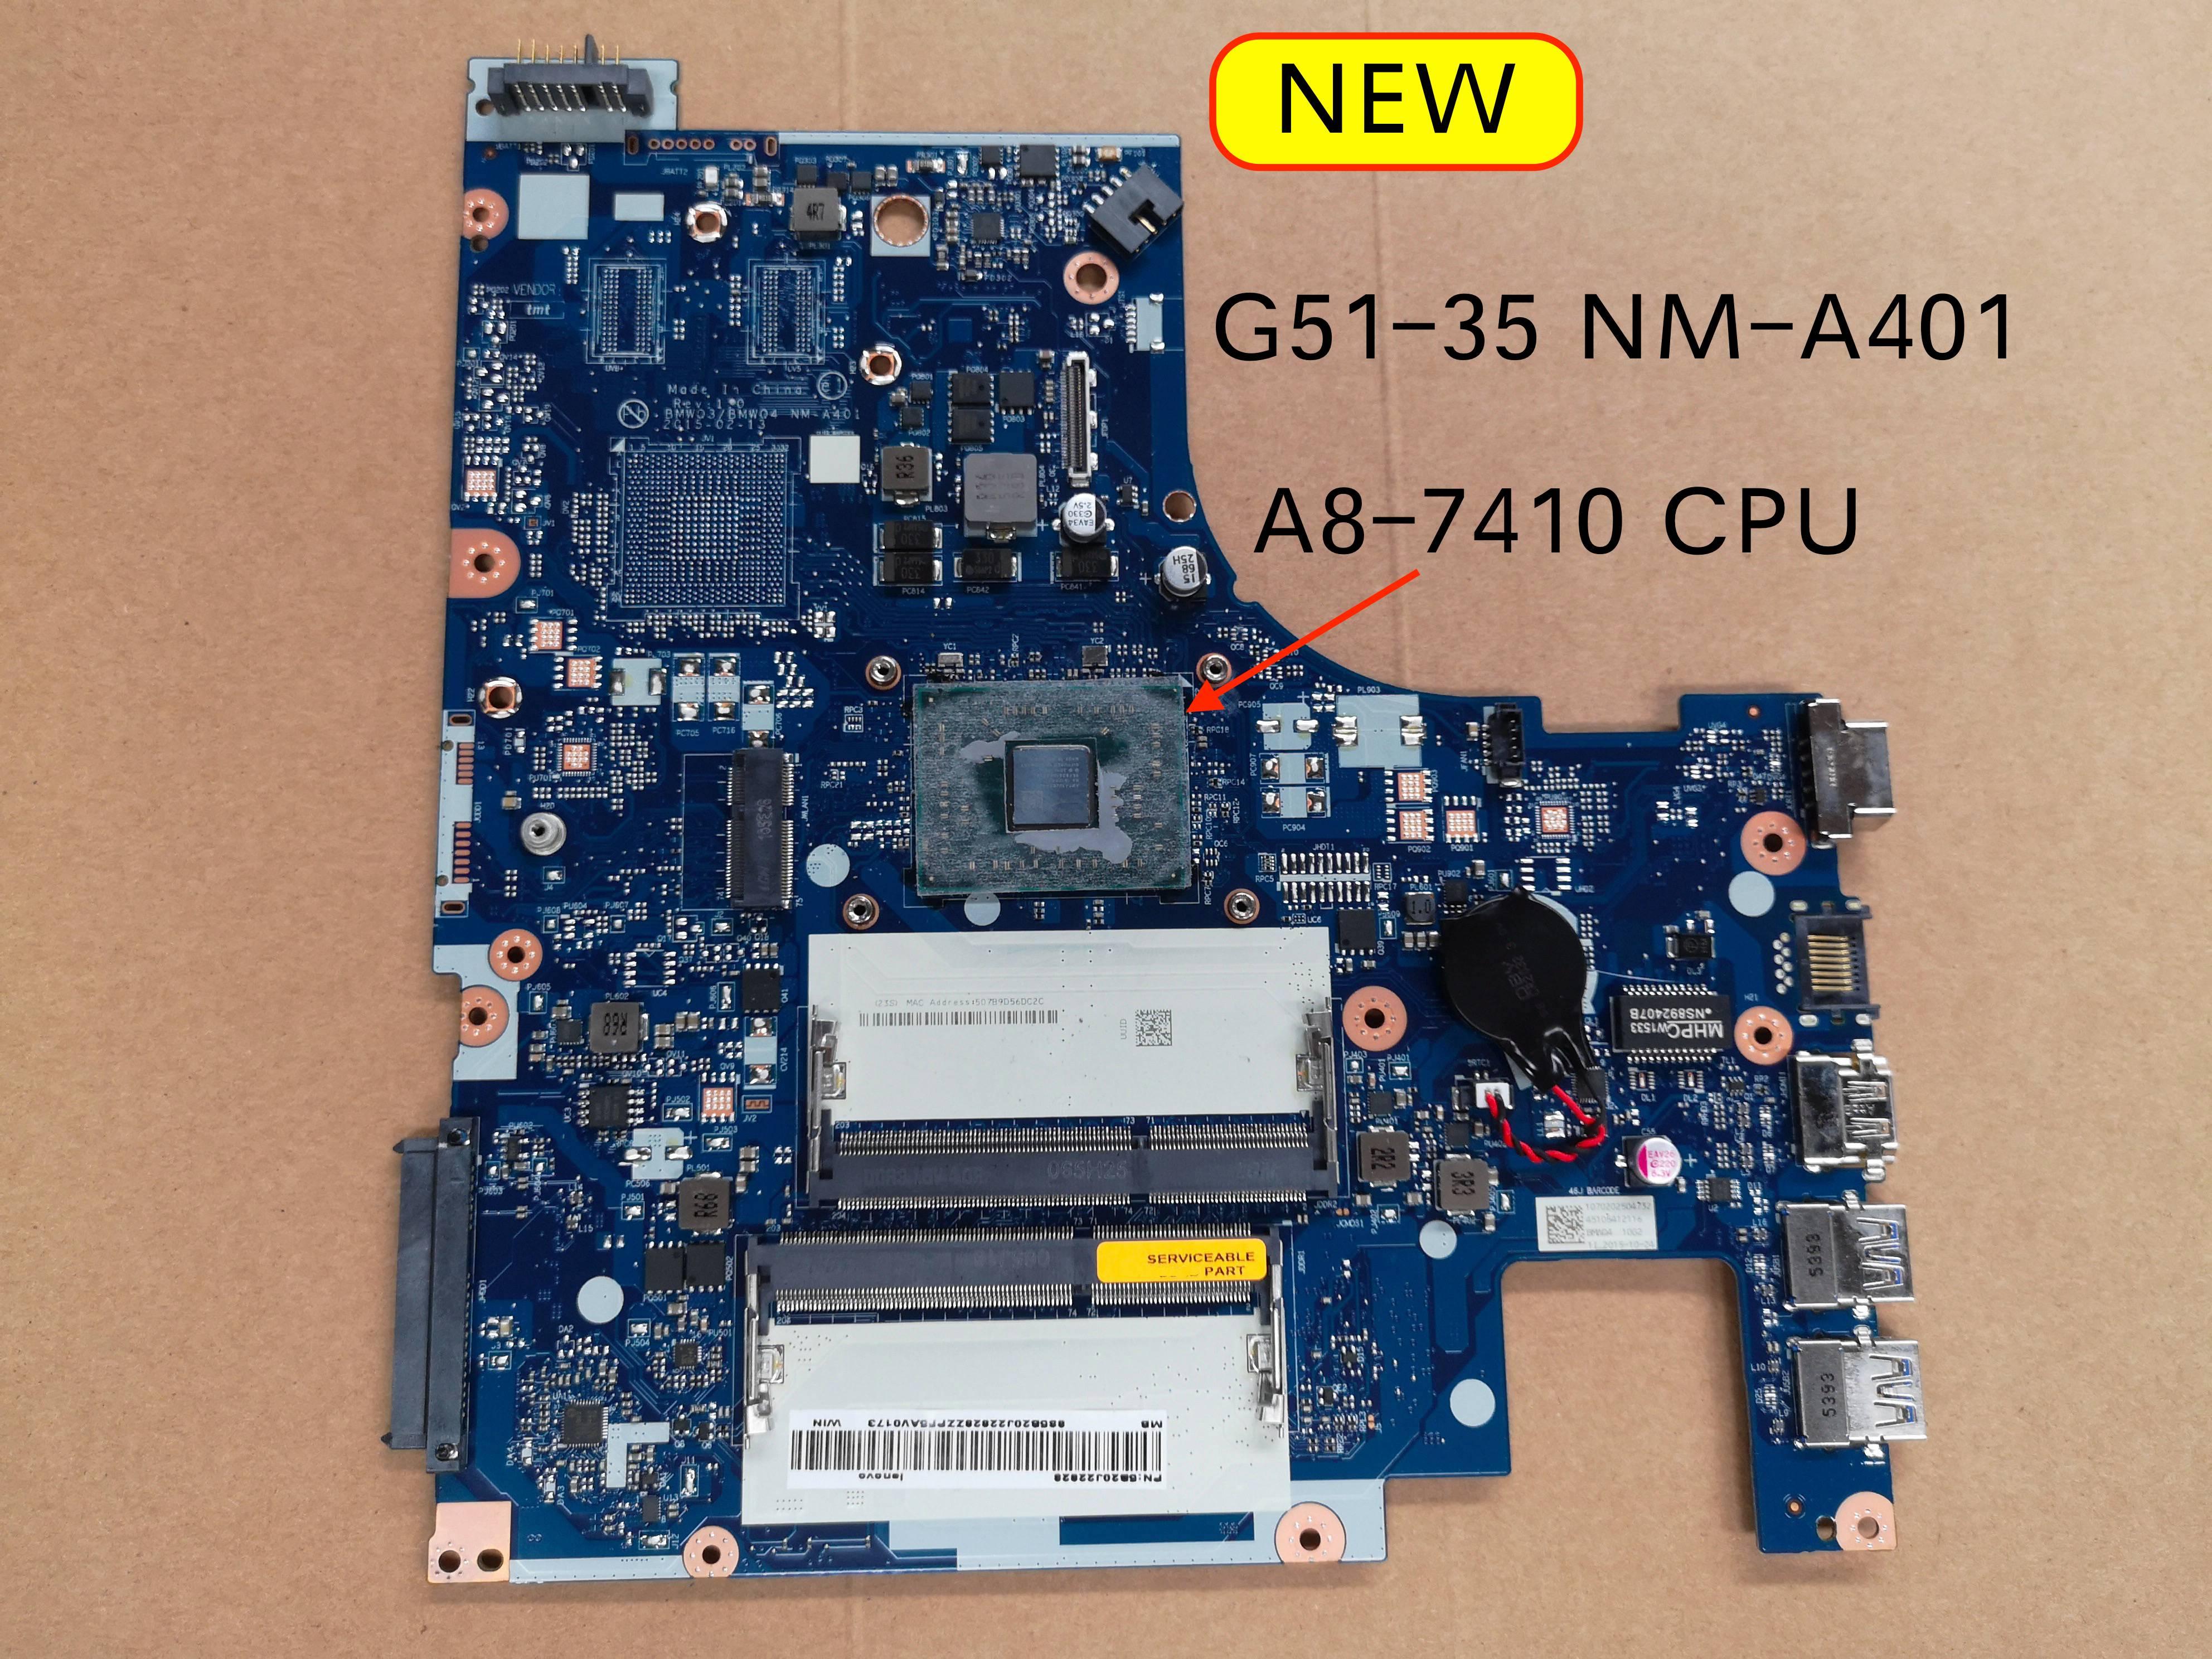 5B20J22828 For Lenovo Ideapad G51-35 G51 35 Laptop Motherboard BMWQ3/BMWQ4 NM-A401 Mainboard A8-7410U DDR3